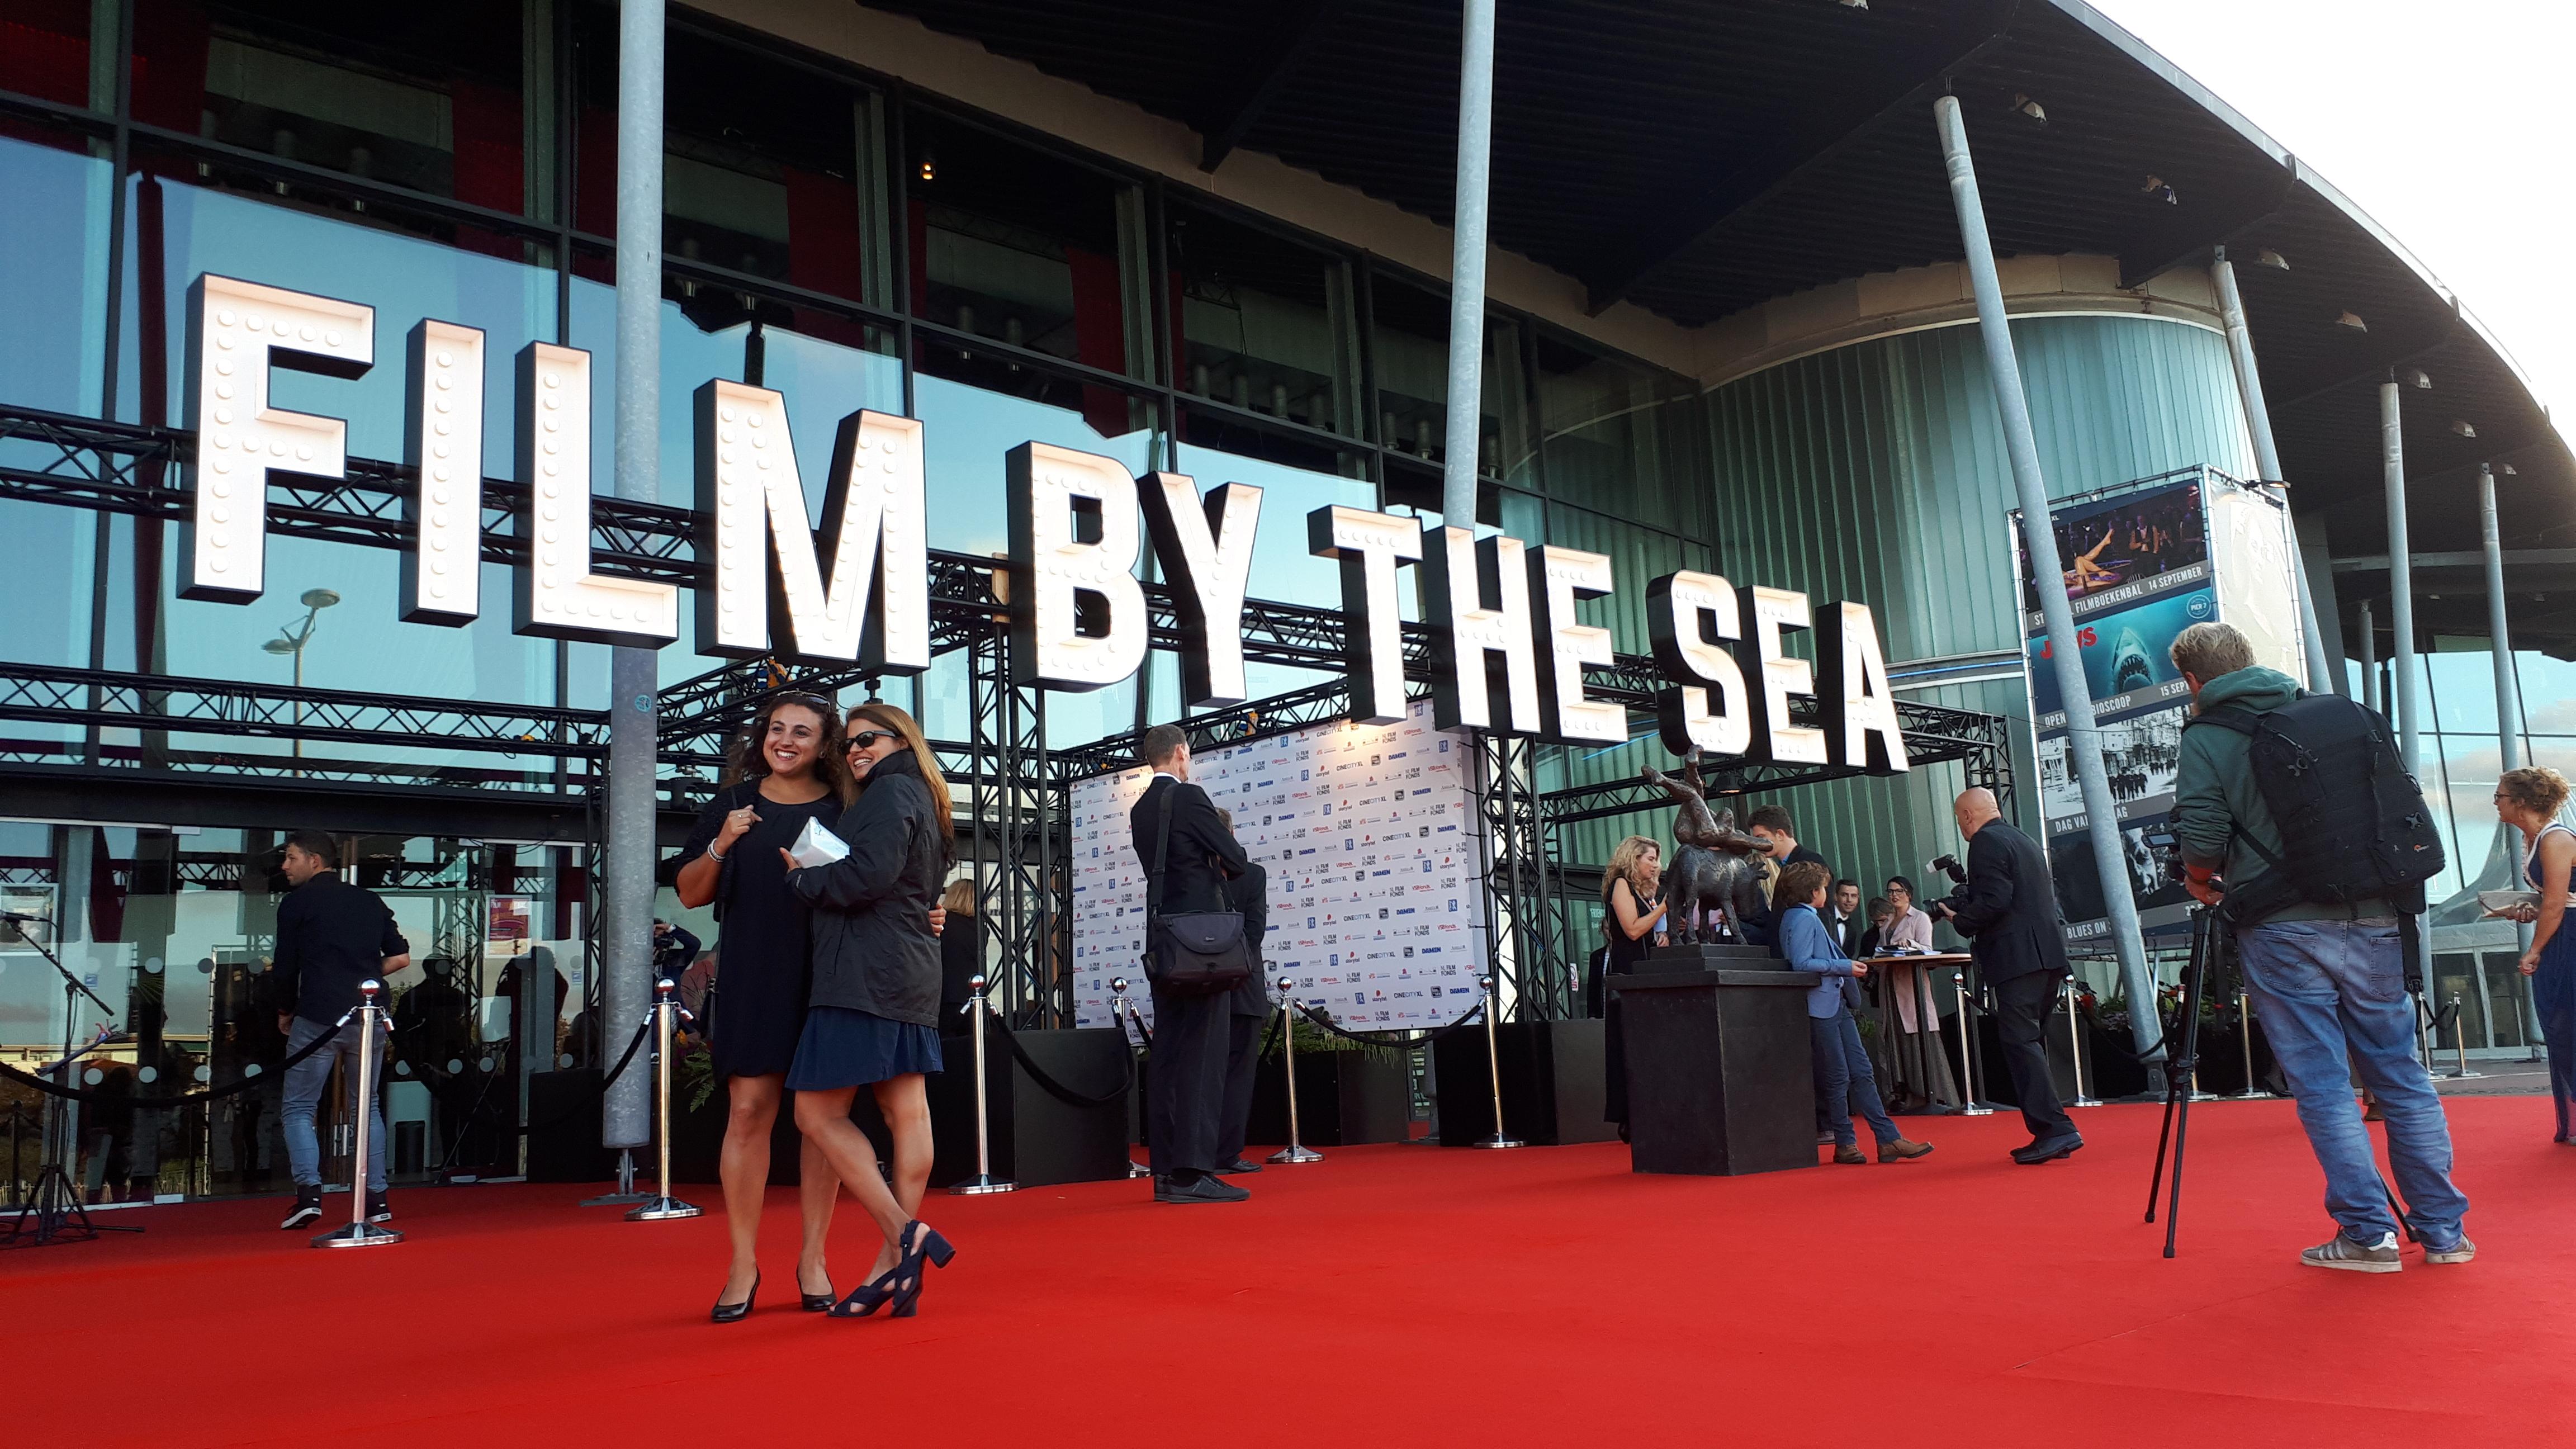 Film by the Sea - Wikipedia